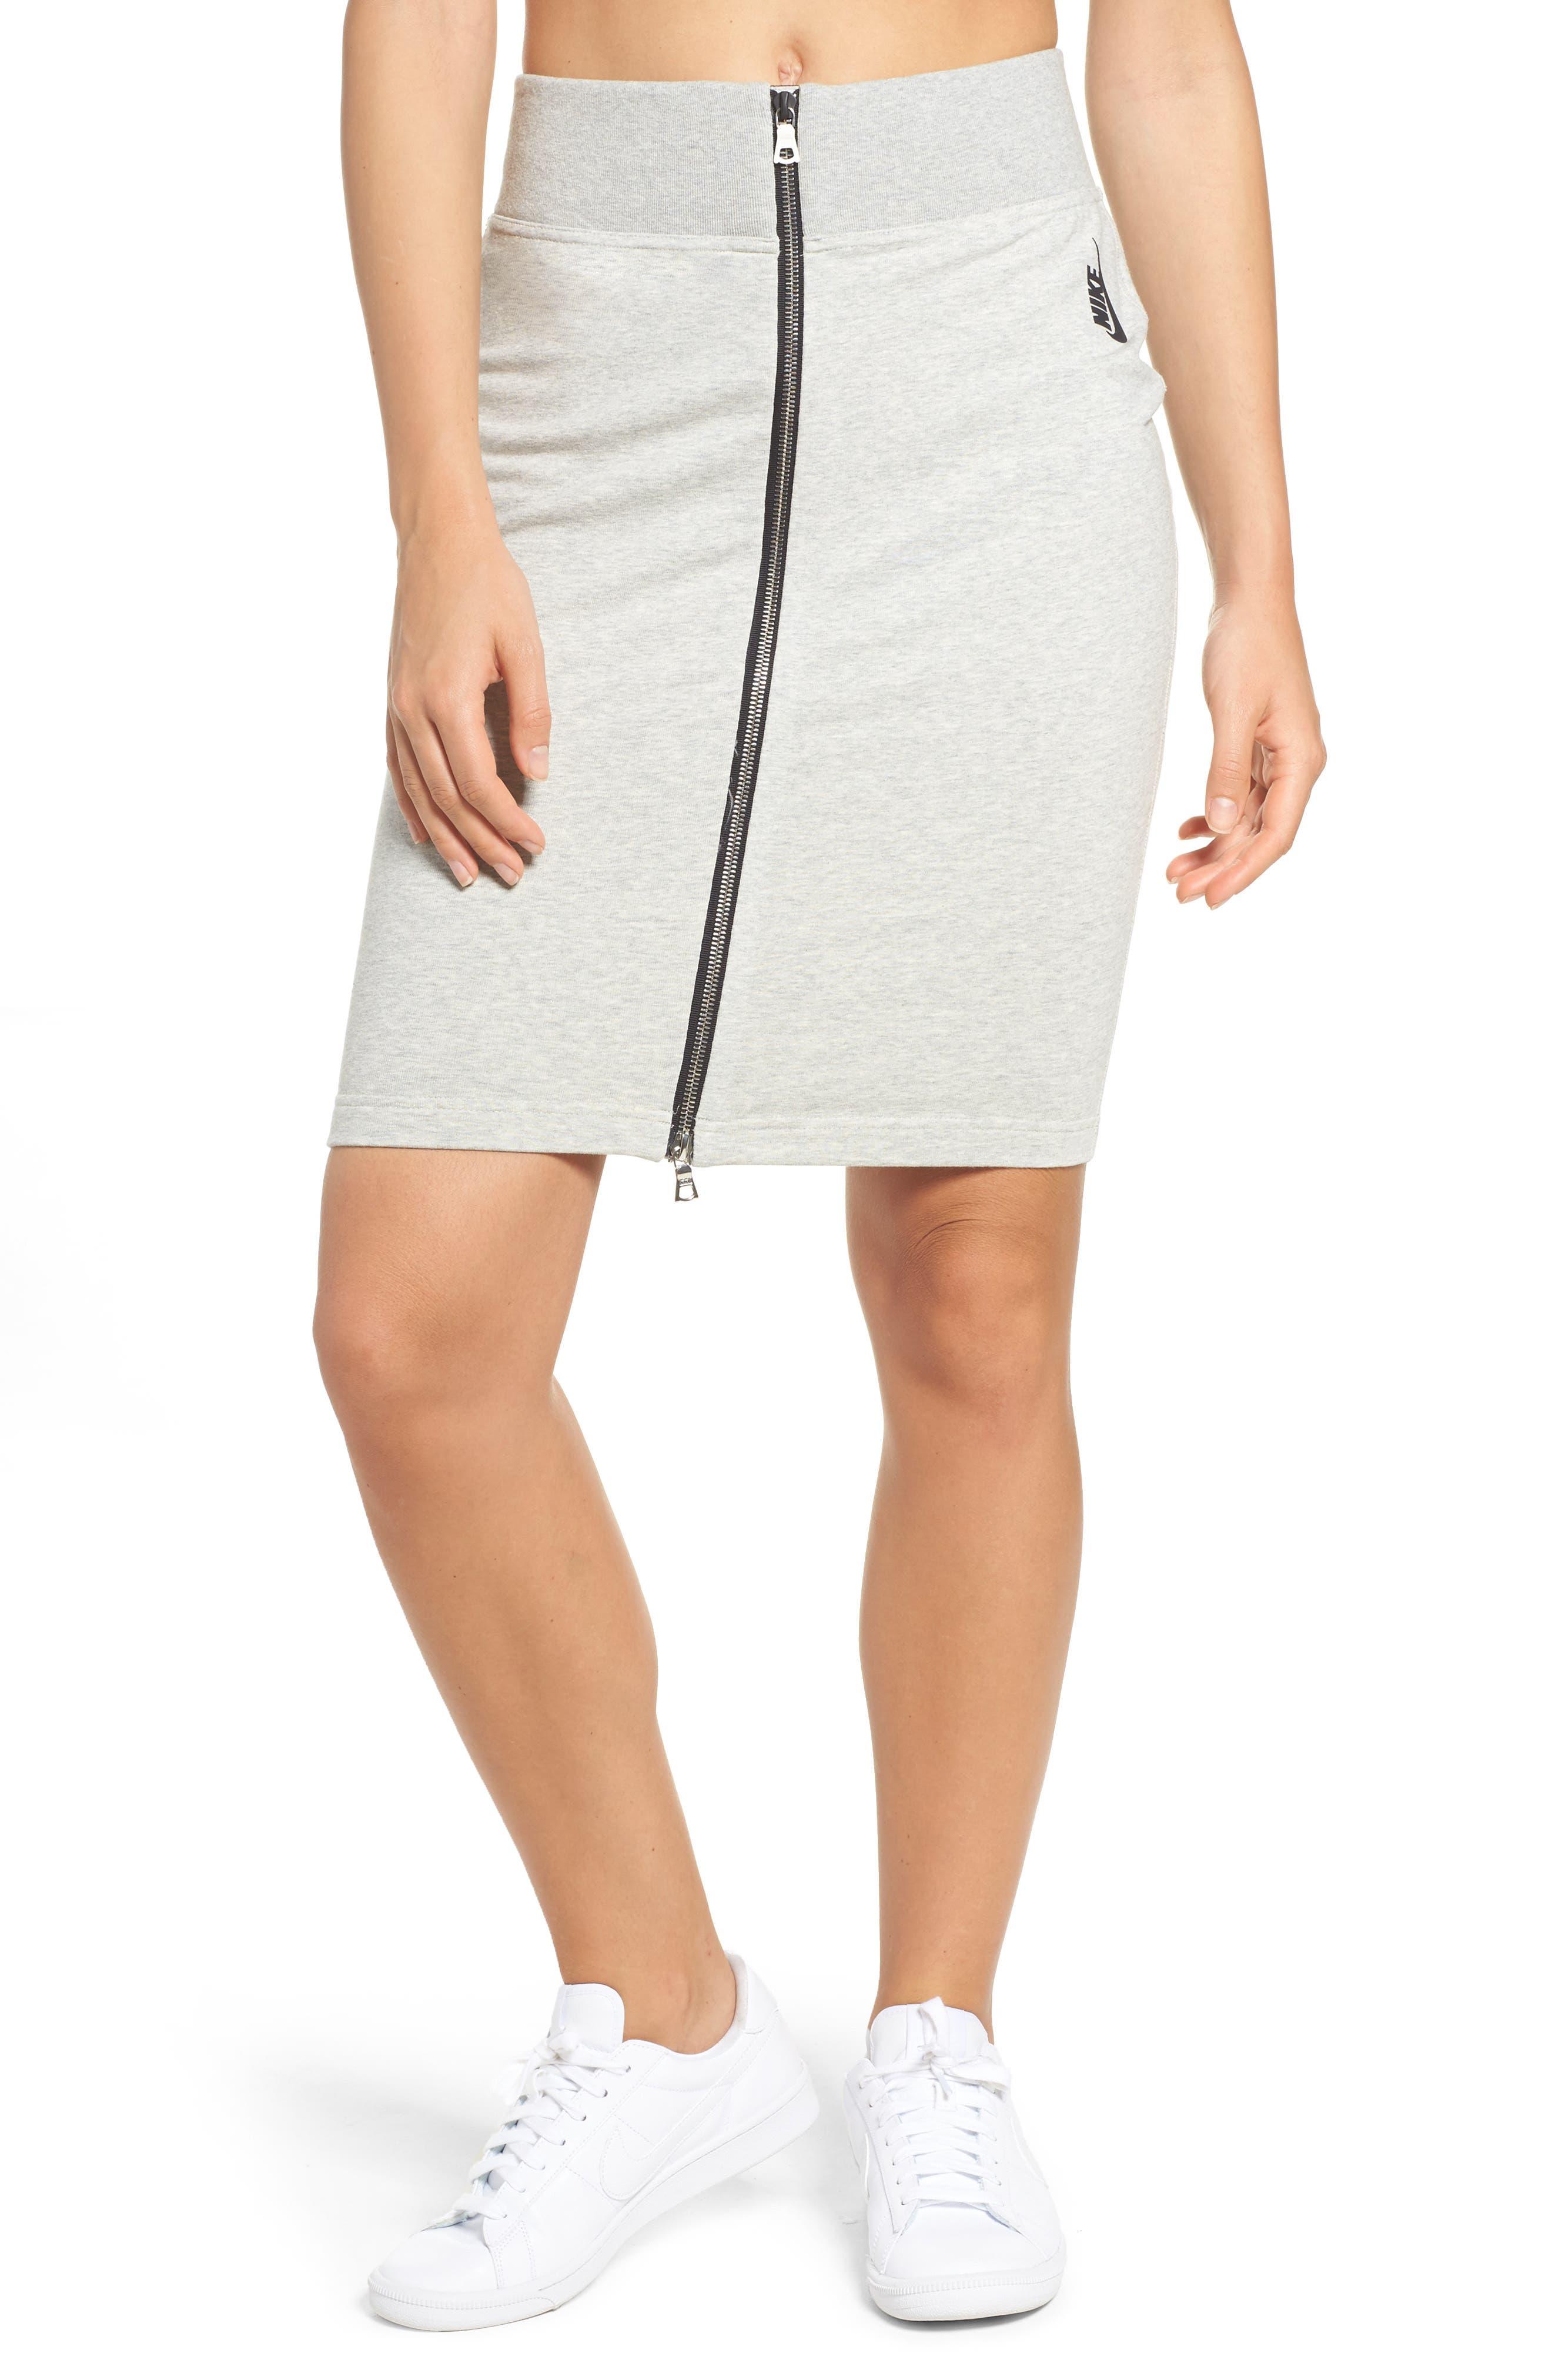 Essentials Sport Skirt,                         Main,                         color, Grey Heather/ Black